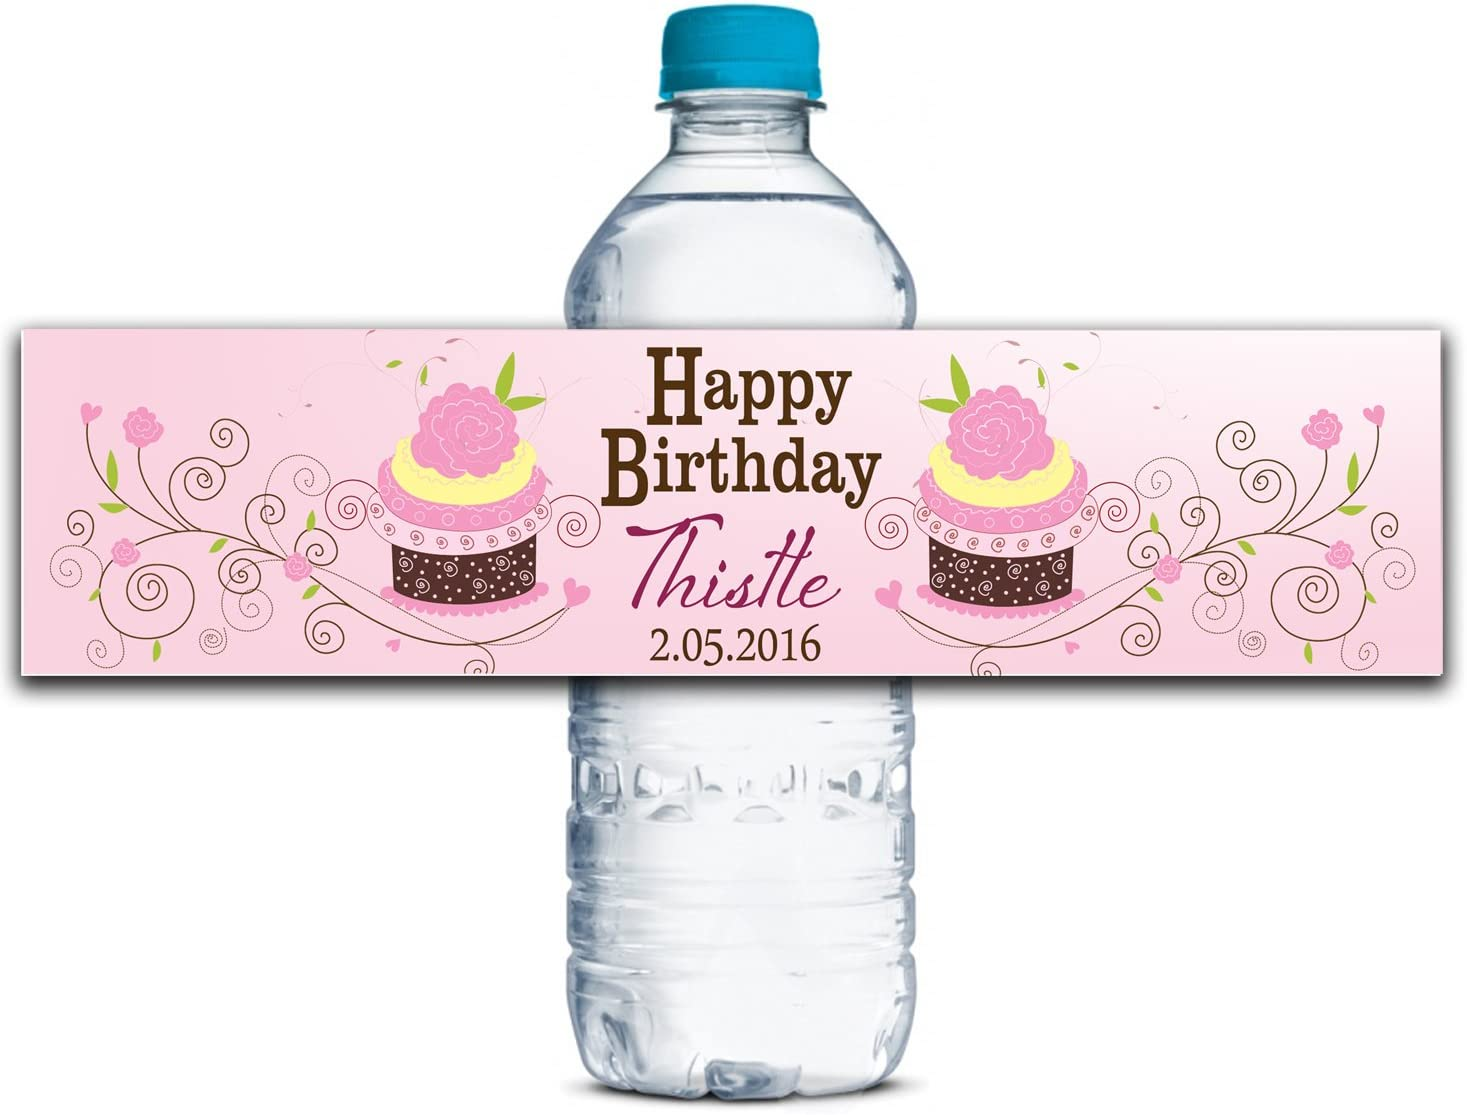 Custom Water 5☆大好評 Bottle Labels Waterproof 正規品送料無料 Birt Adhesive Personalized